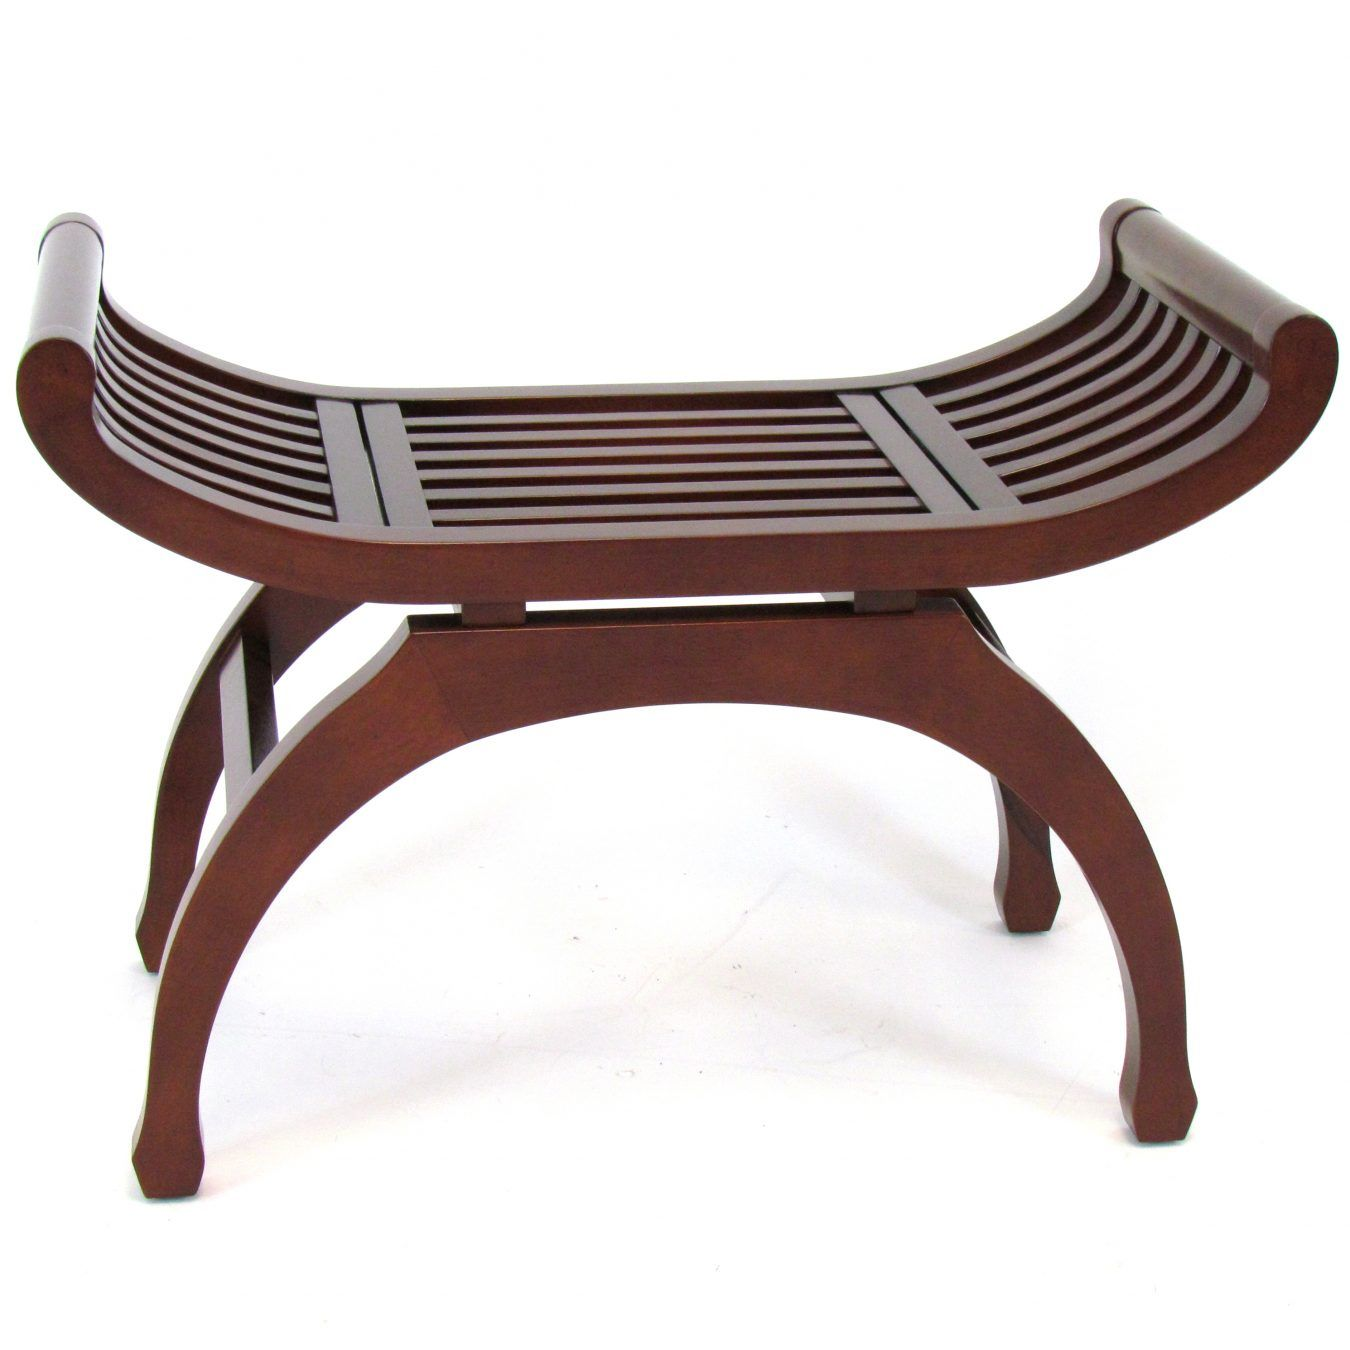 Indonesian Hard Wood Stool Hardwood Benches Furniture Stool